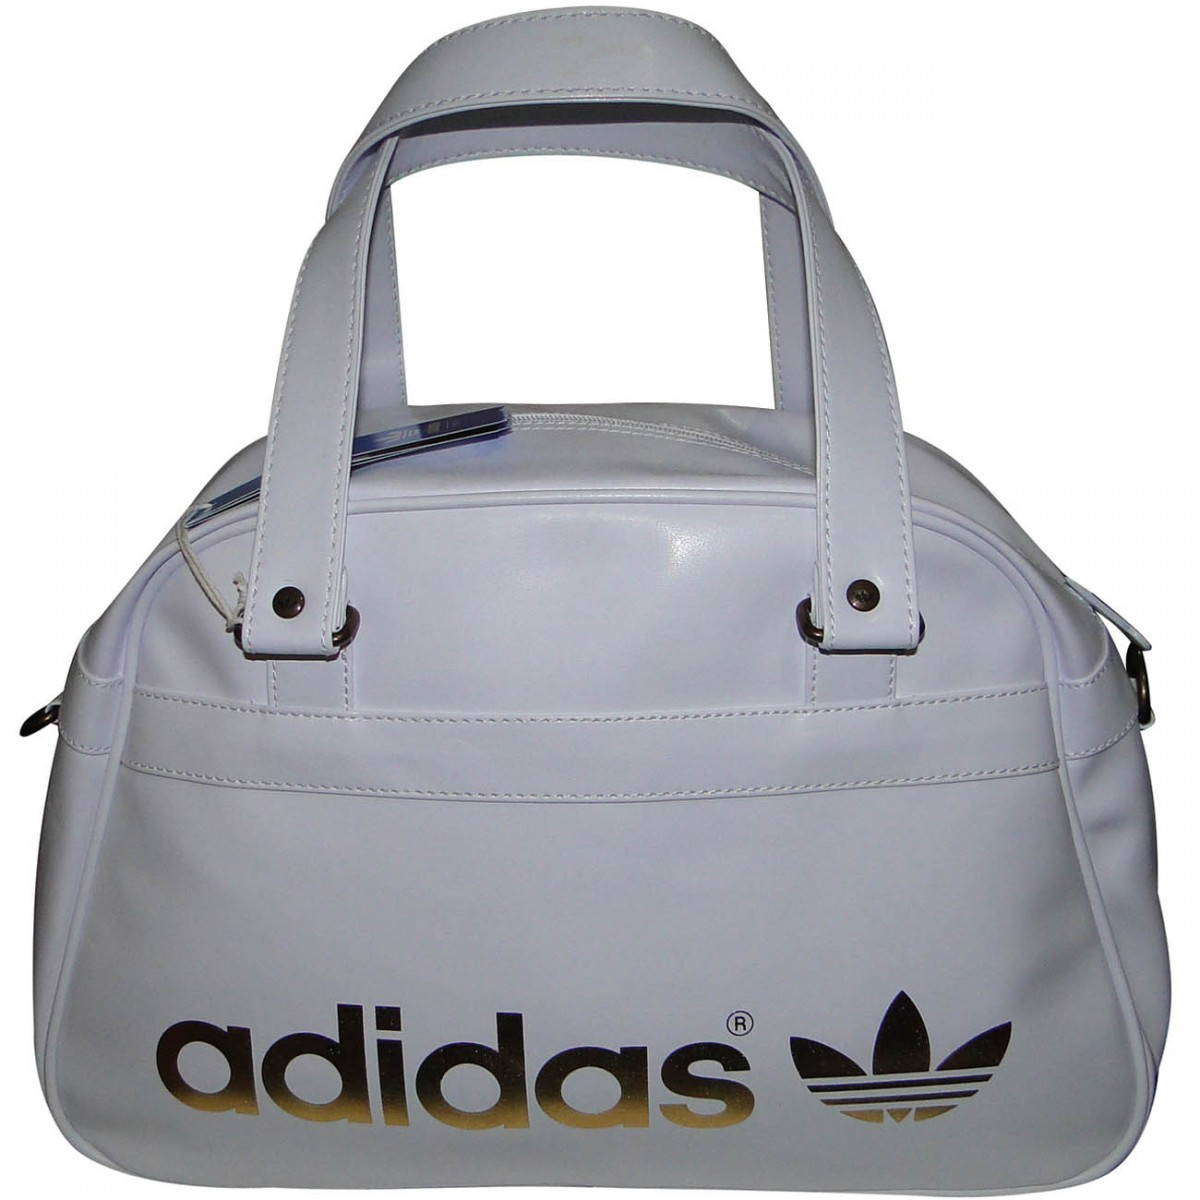 Adidas Adicolor Bolsa 5566 Chuteira Brancodourado Nike Bowling zS8HqqCwdE